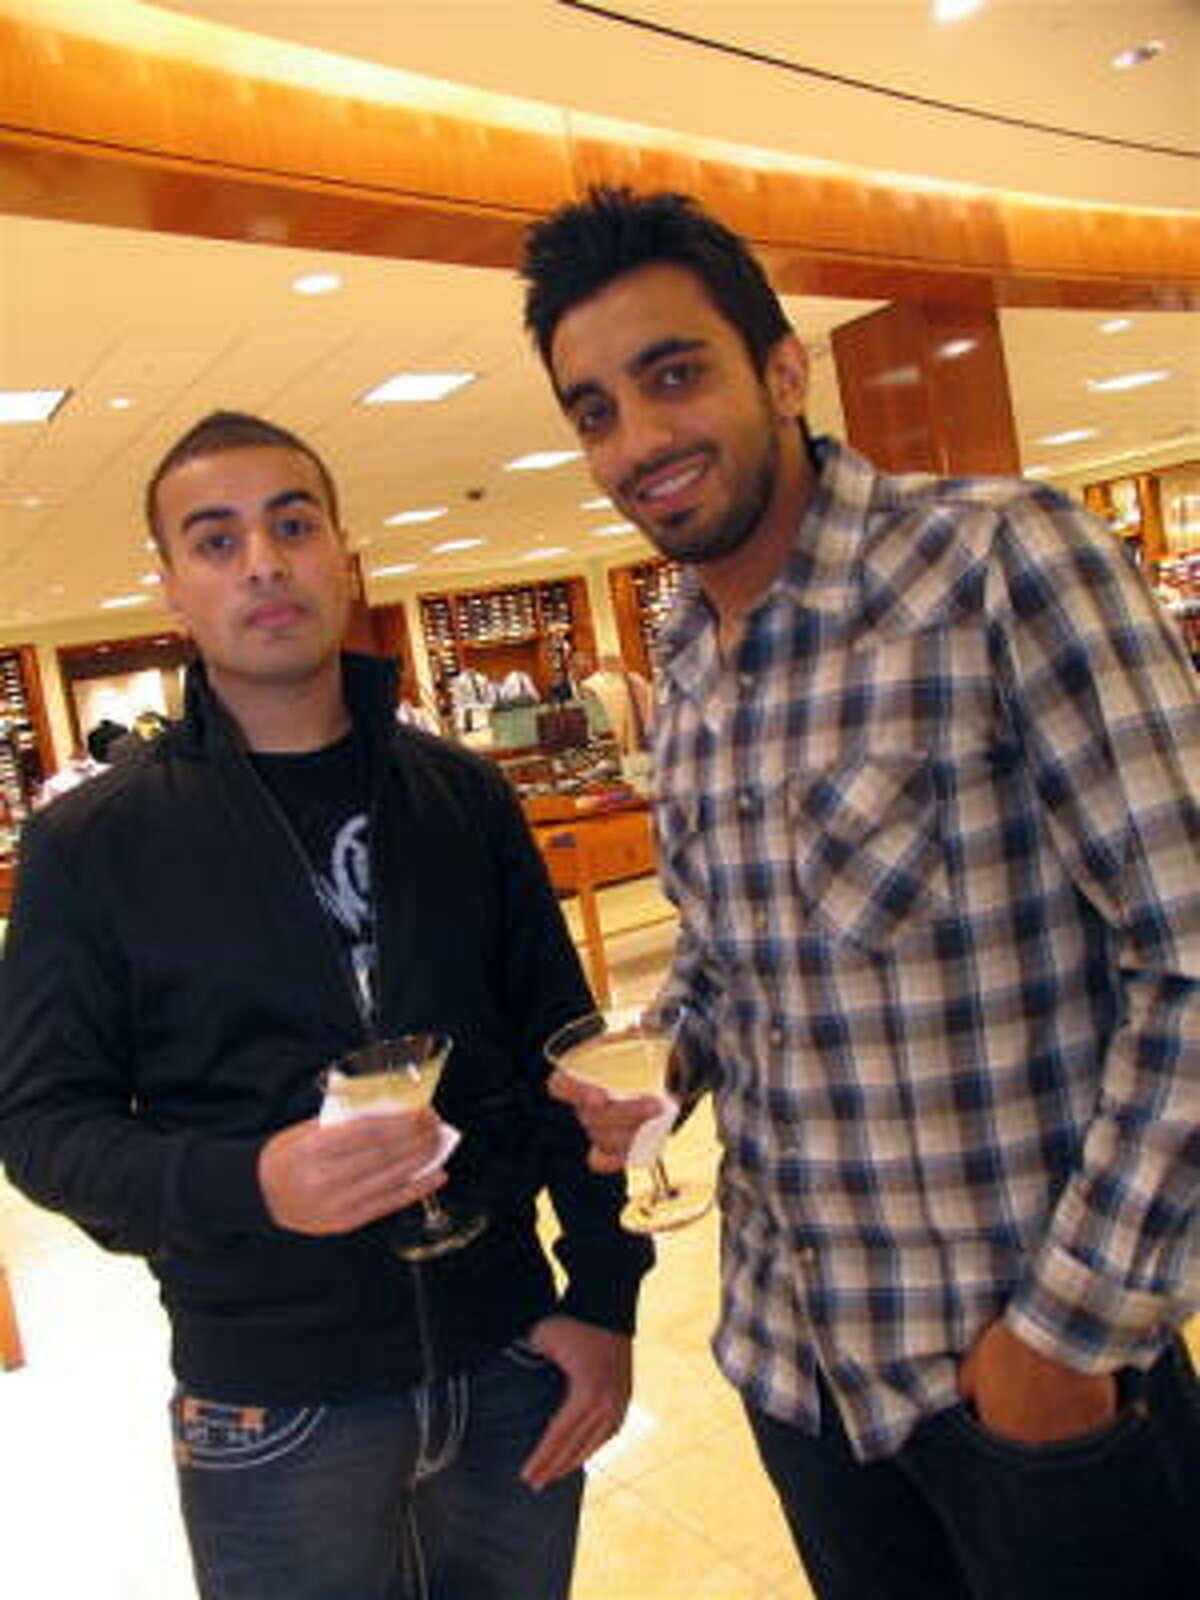 Shobi Awan, left, and Nawaf Gheewala